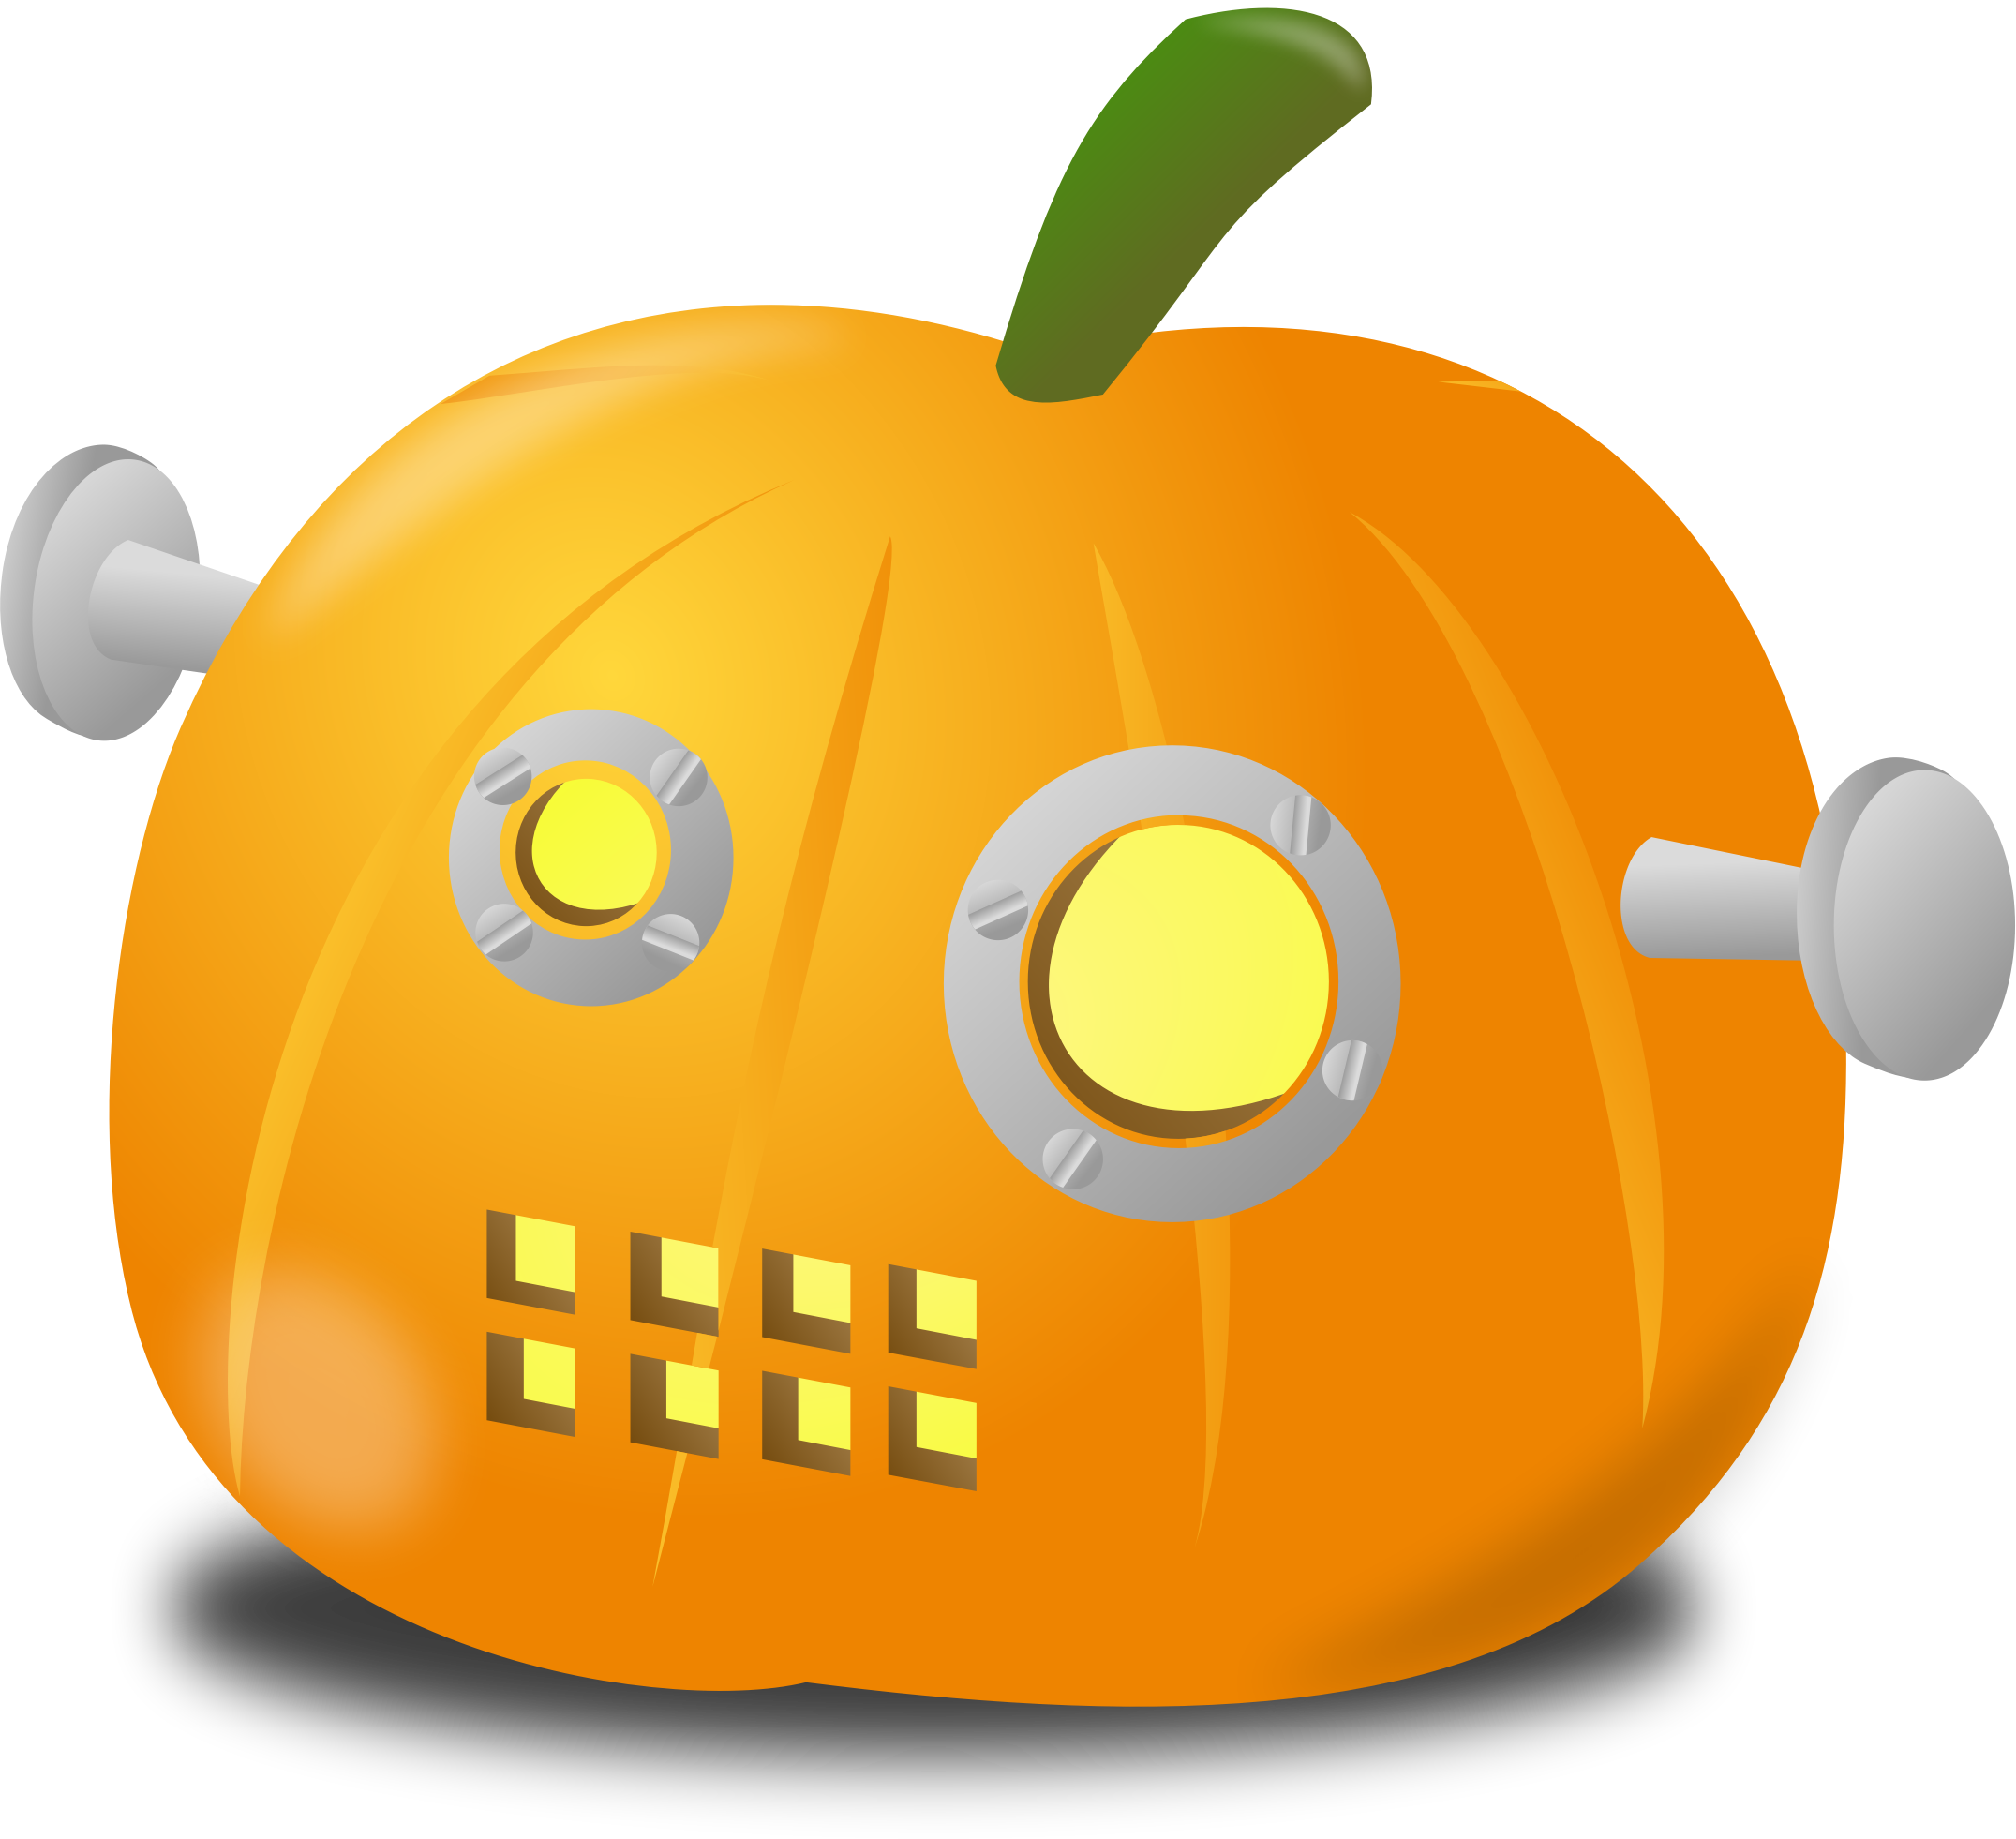 Square pumpkin clipart png free Clipart - Robot pumpkin png free